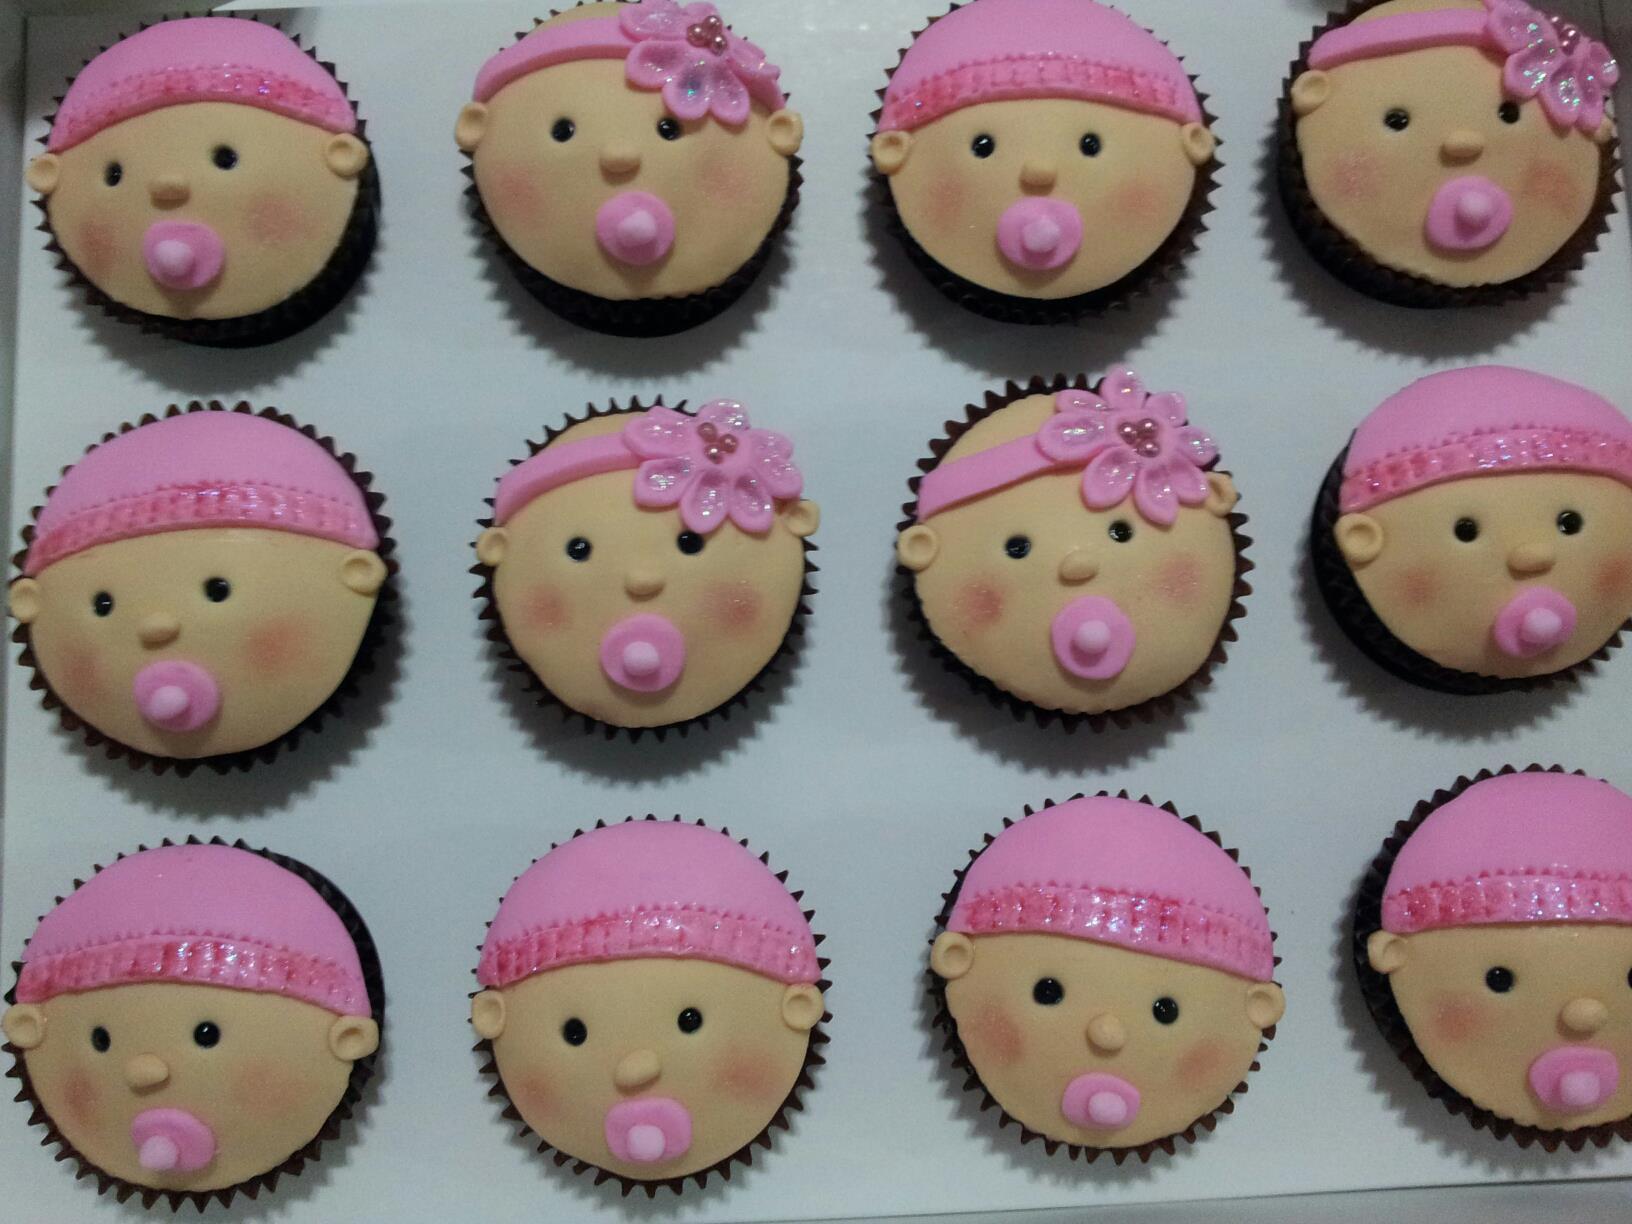 10 Cute Baby Shower Cupcakes Photo Girl Baby Shower Cupcake